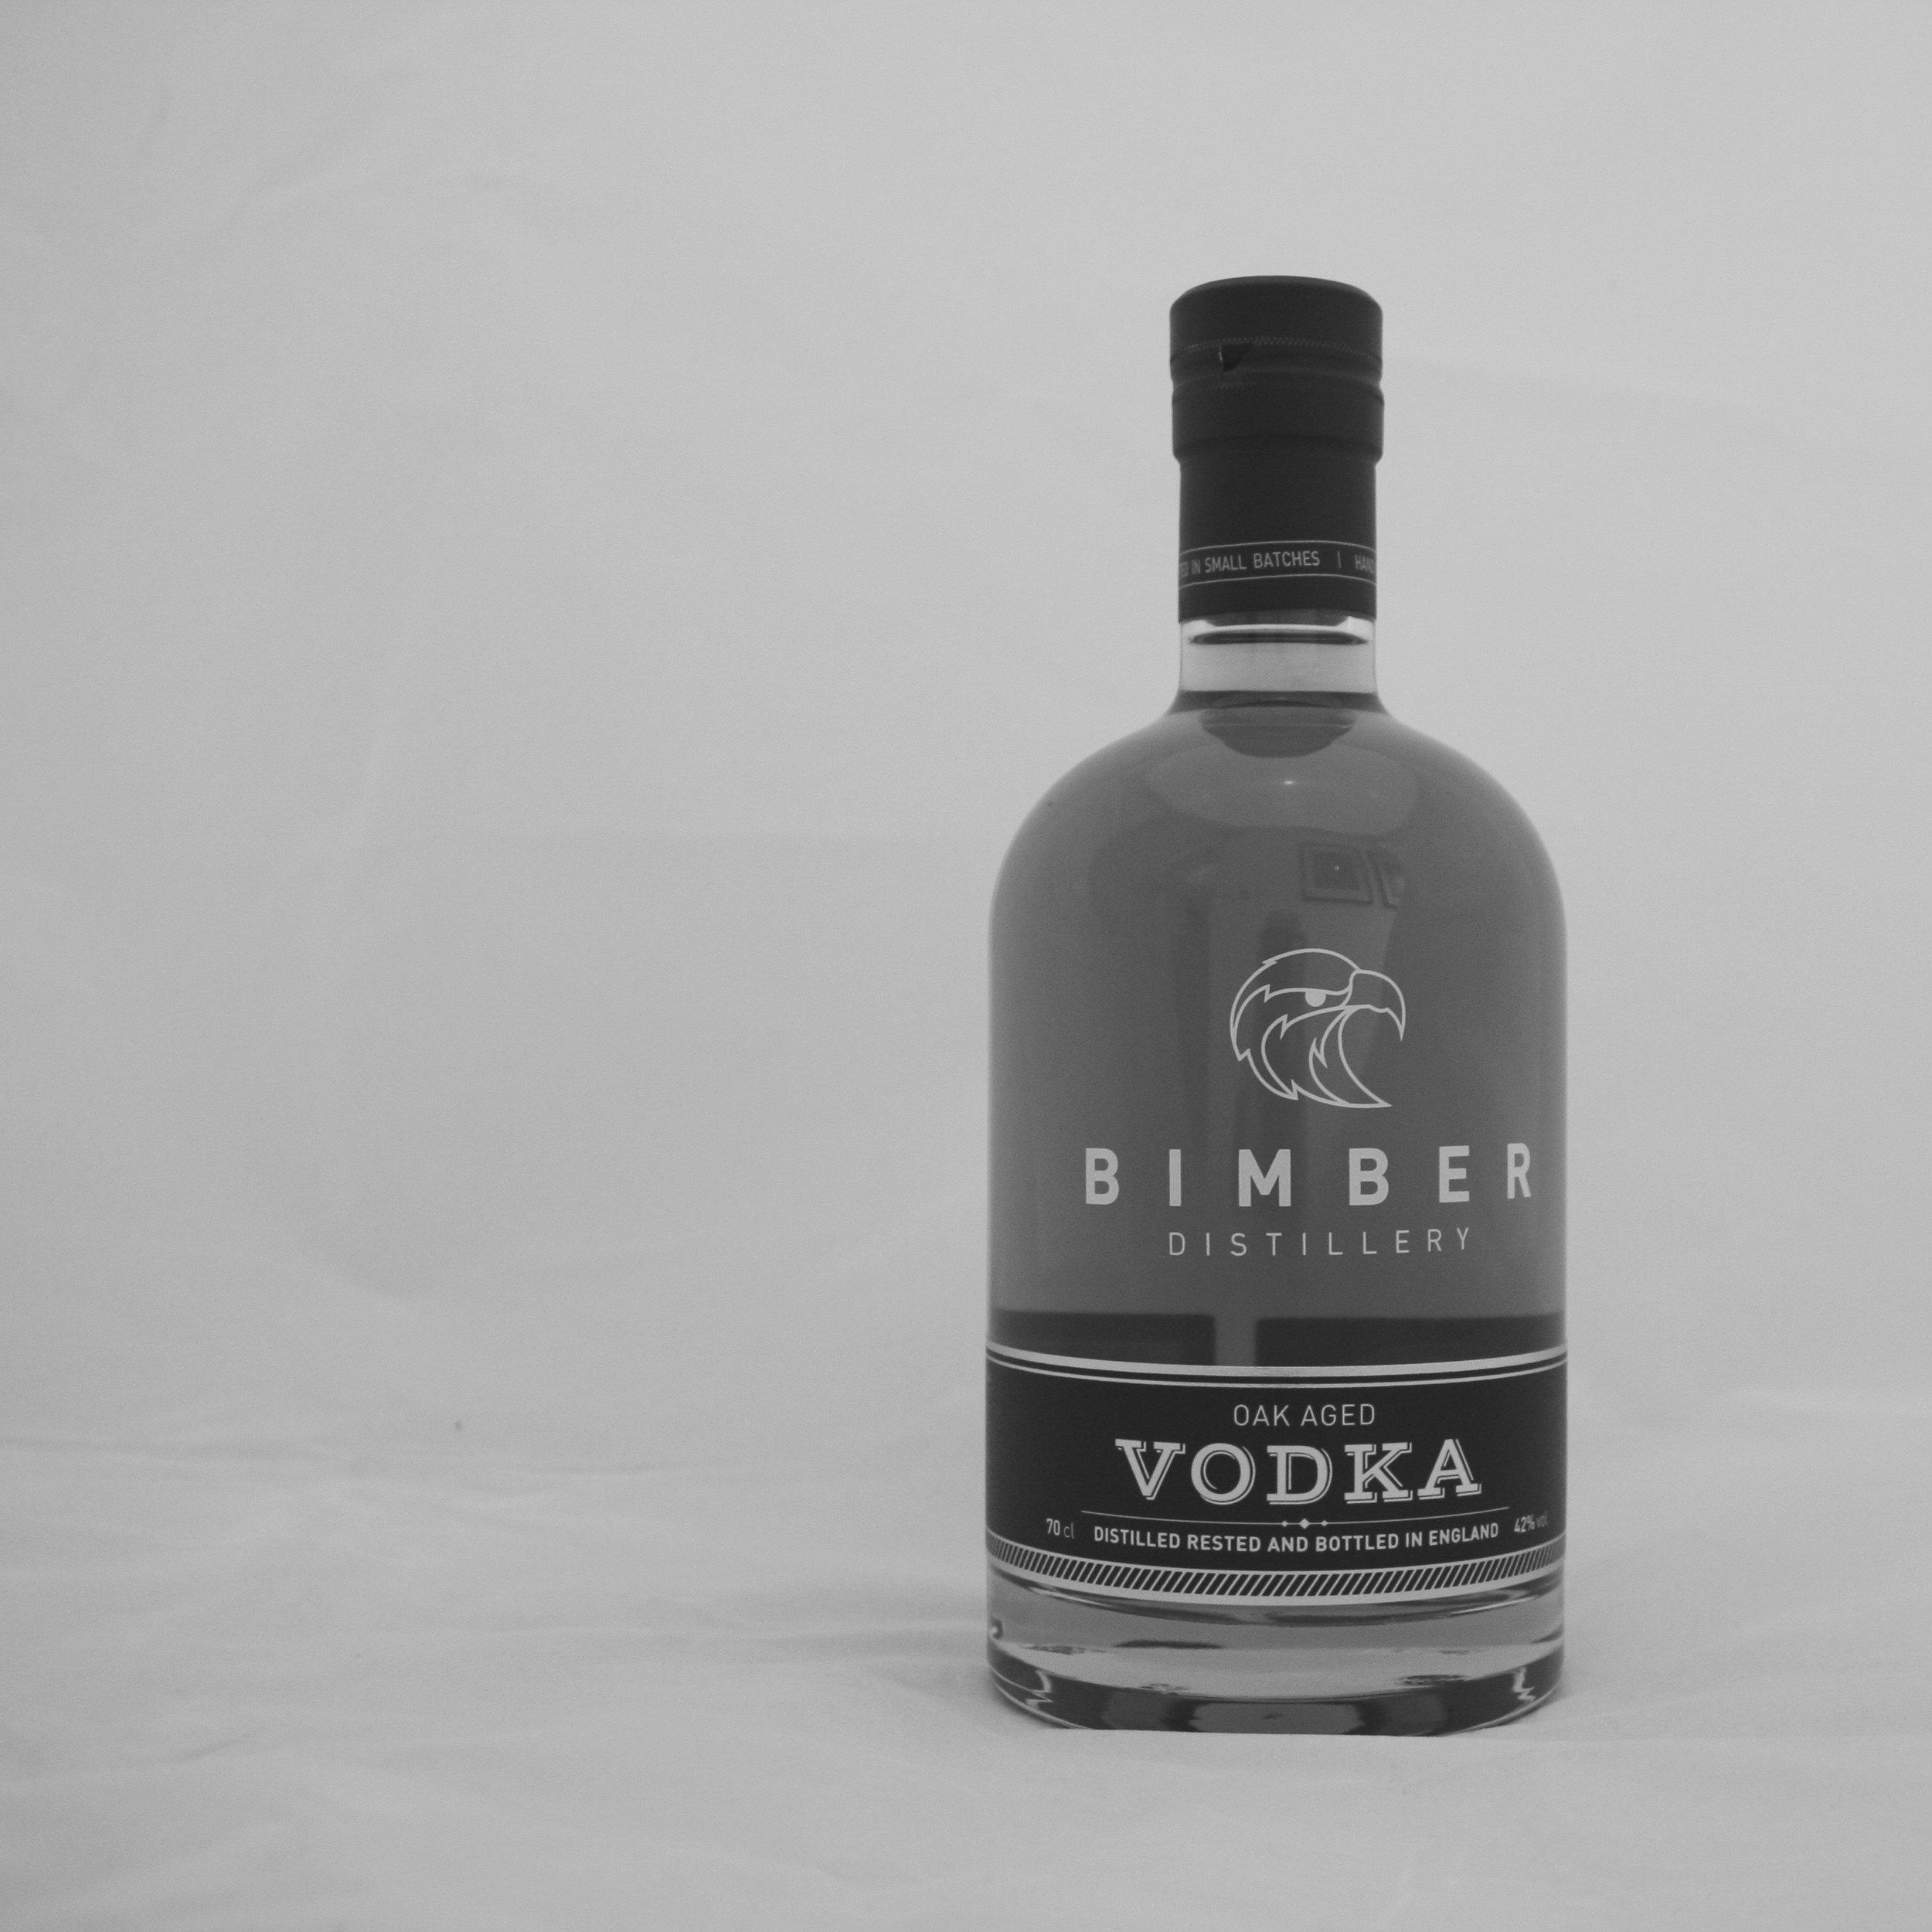 Bimber Aged Vodka bottle